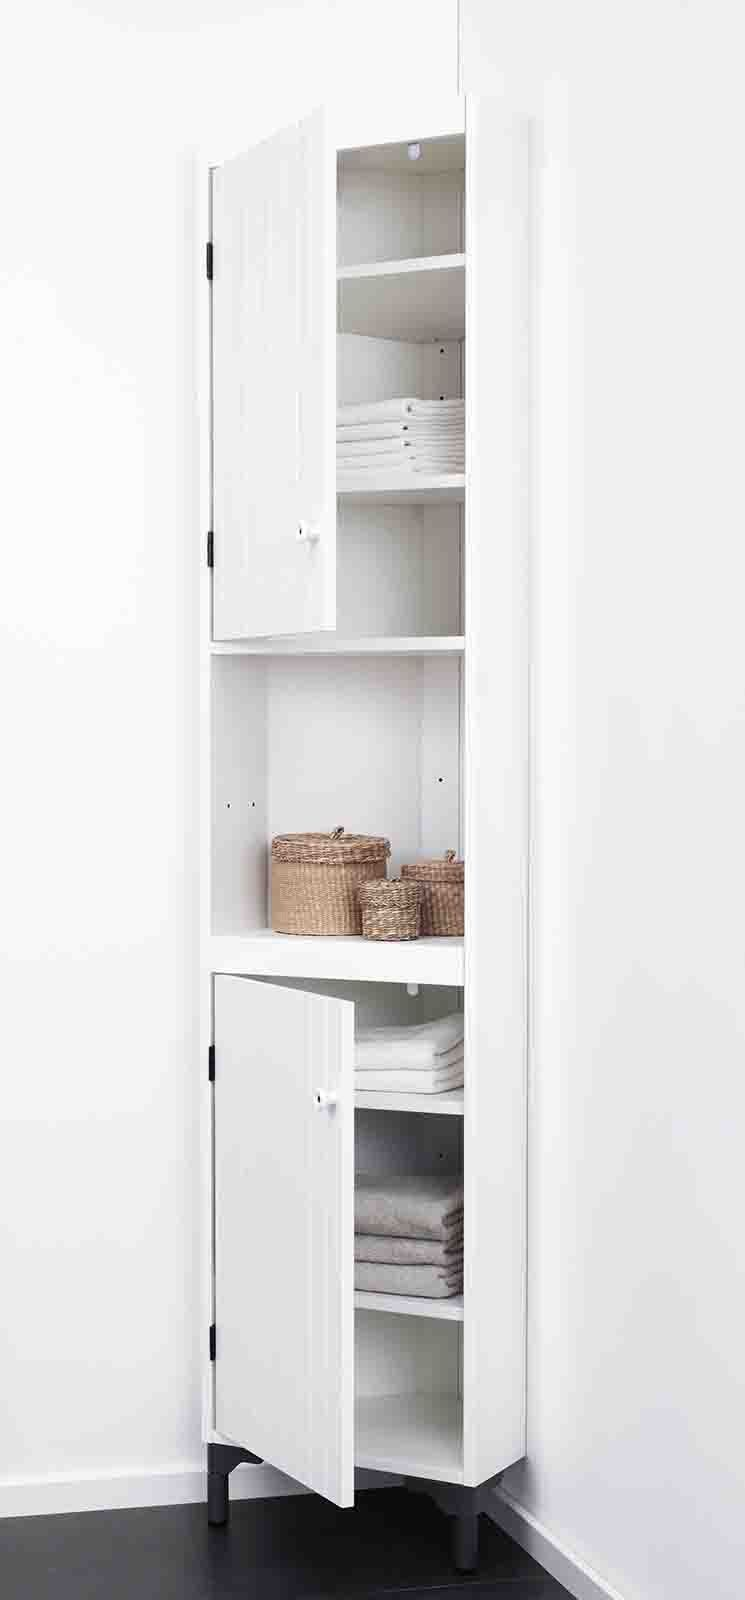 Pensile Angolare Cucina Ikea mobile ad angolo in noce